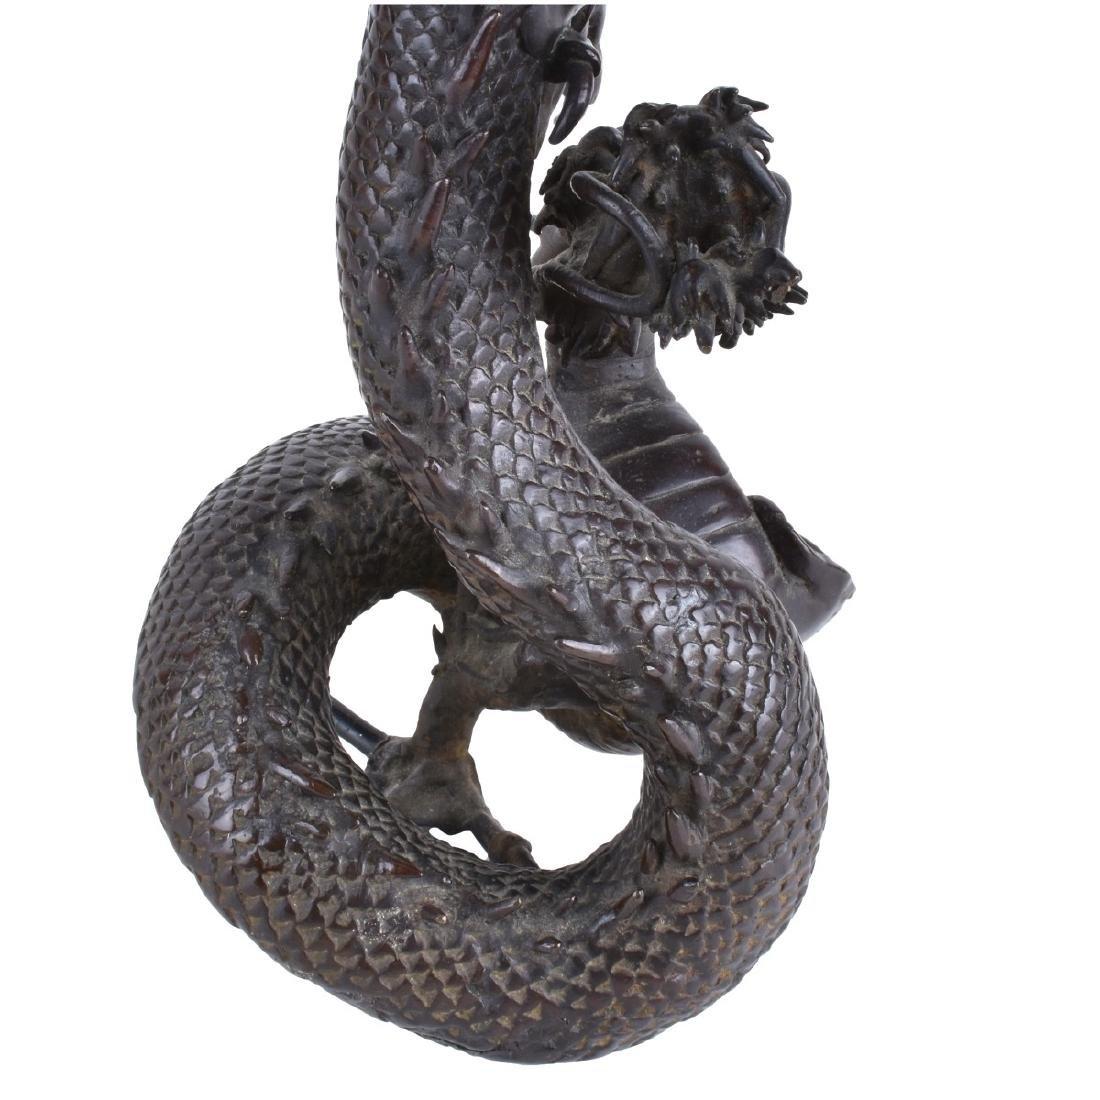 Chinese Bronze Dragon Candlesticks - 4